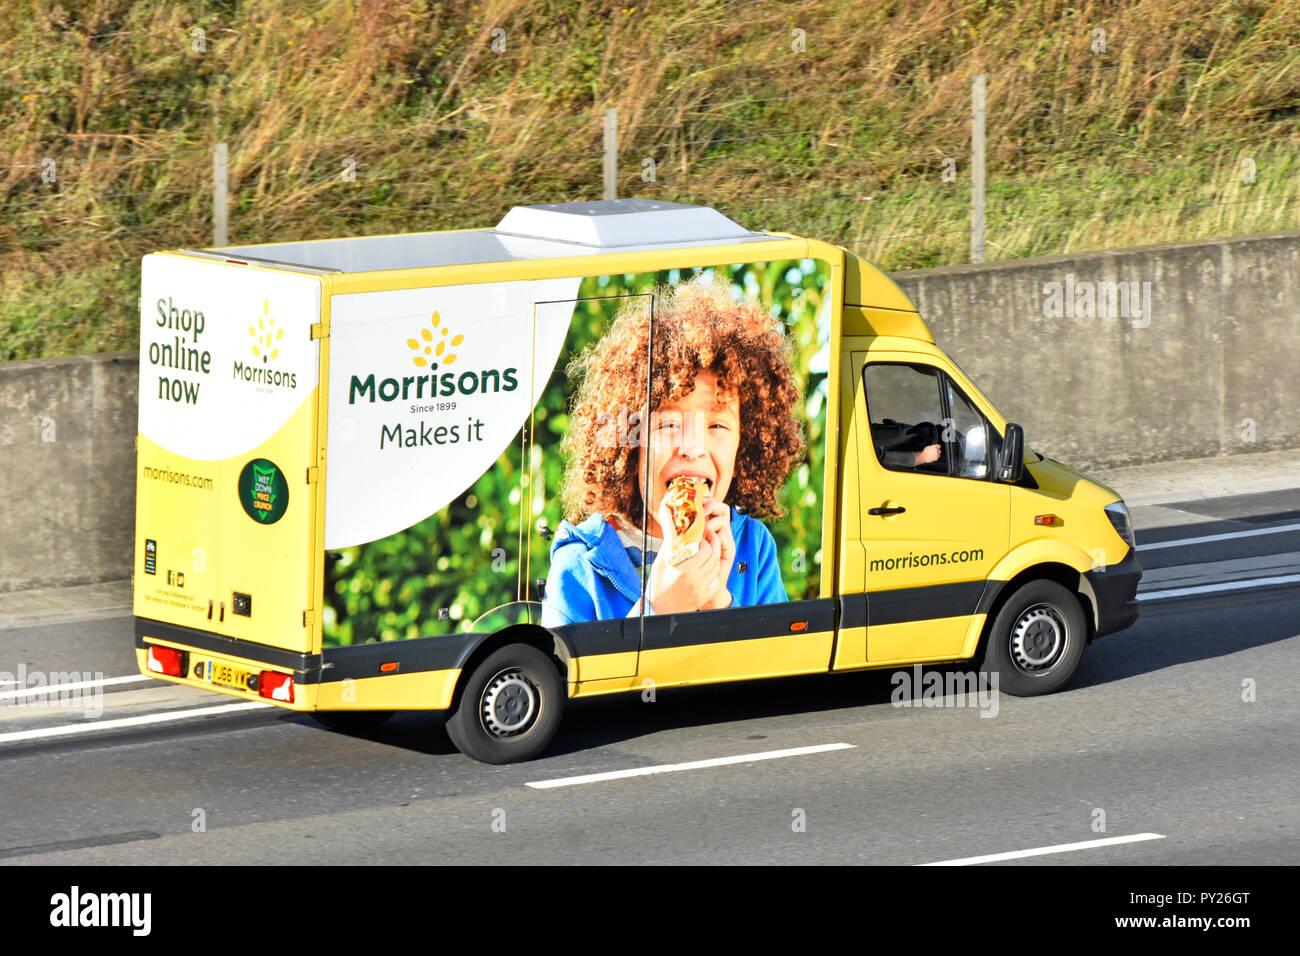 Lado de coloridos Morrisons internet supermercados supermercado de cadena de suministro de alimentos entrega van home servicio de suministro de comida compras online a clientes Essex UK Imagen De Stock